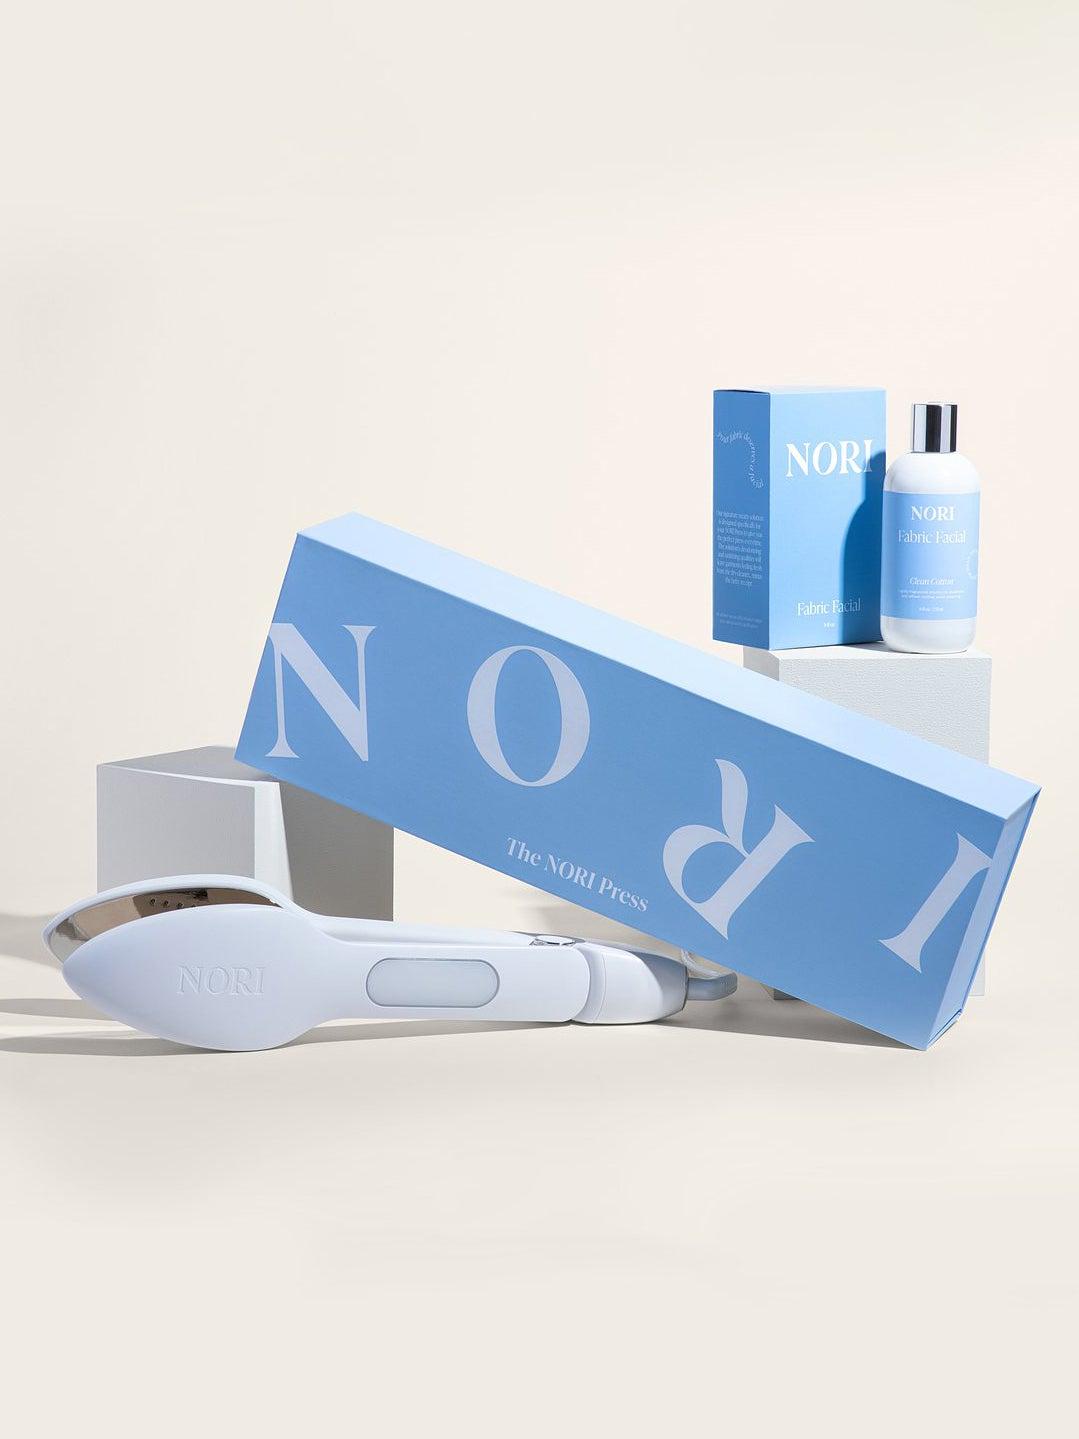 Nori-Iron-Product-review-domino